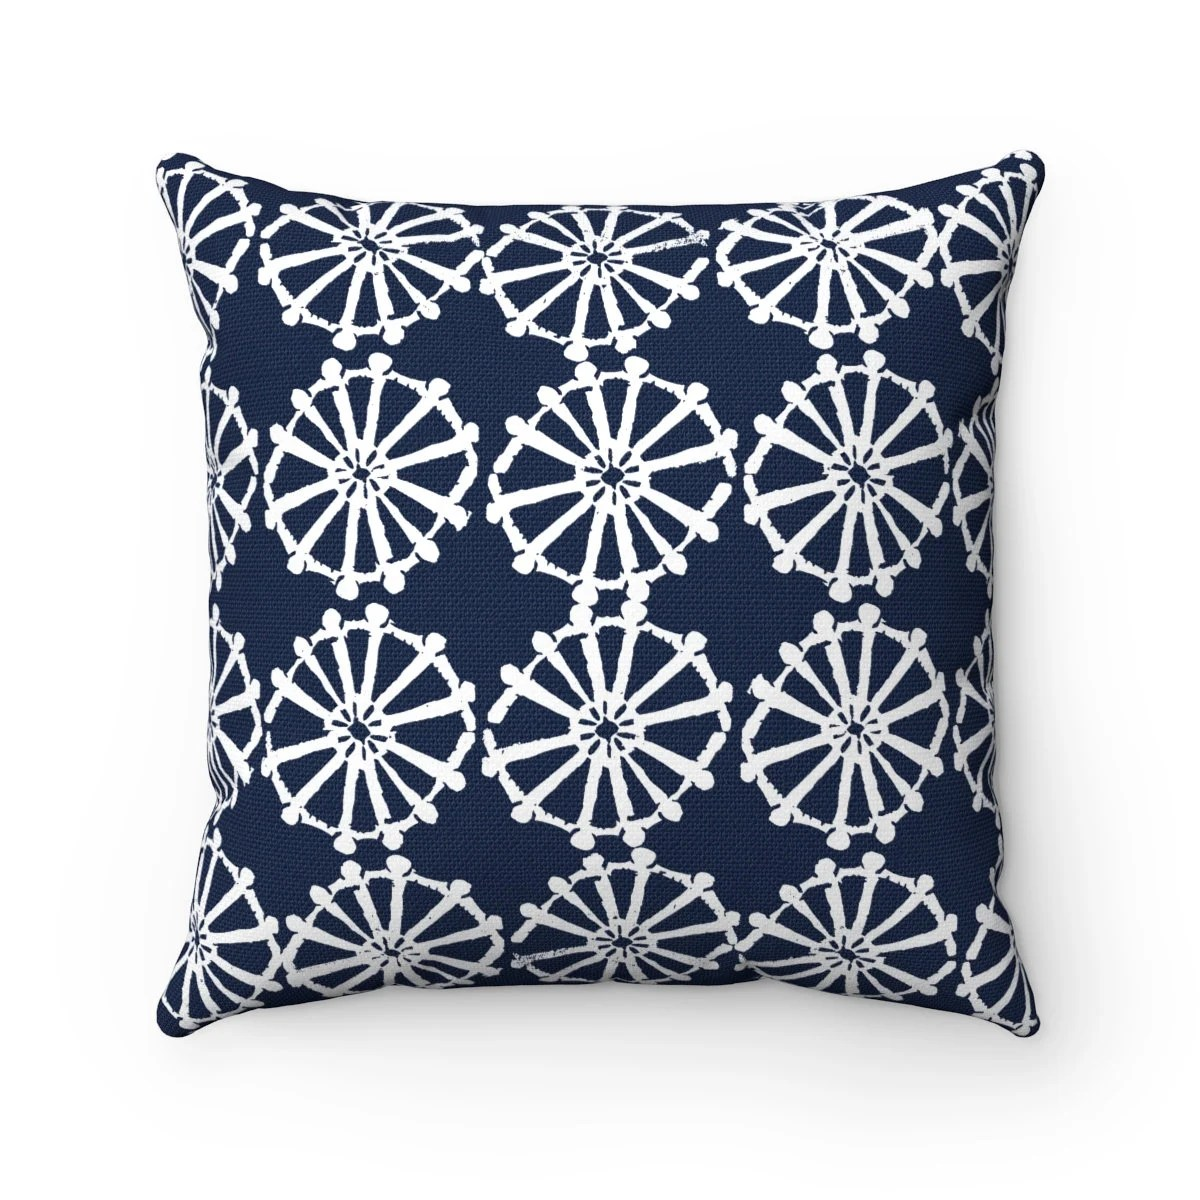 OUTDOOR Throw Pillow  Navy blue Outdoor Pillow  Navy